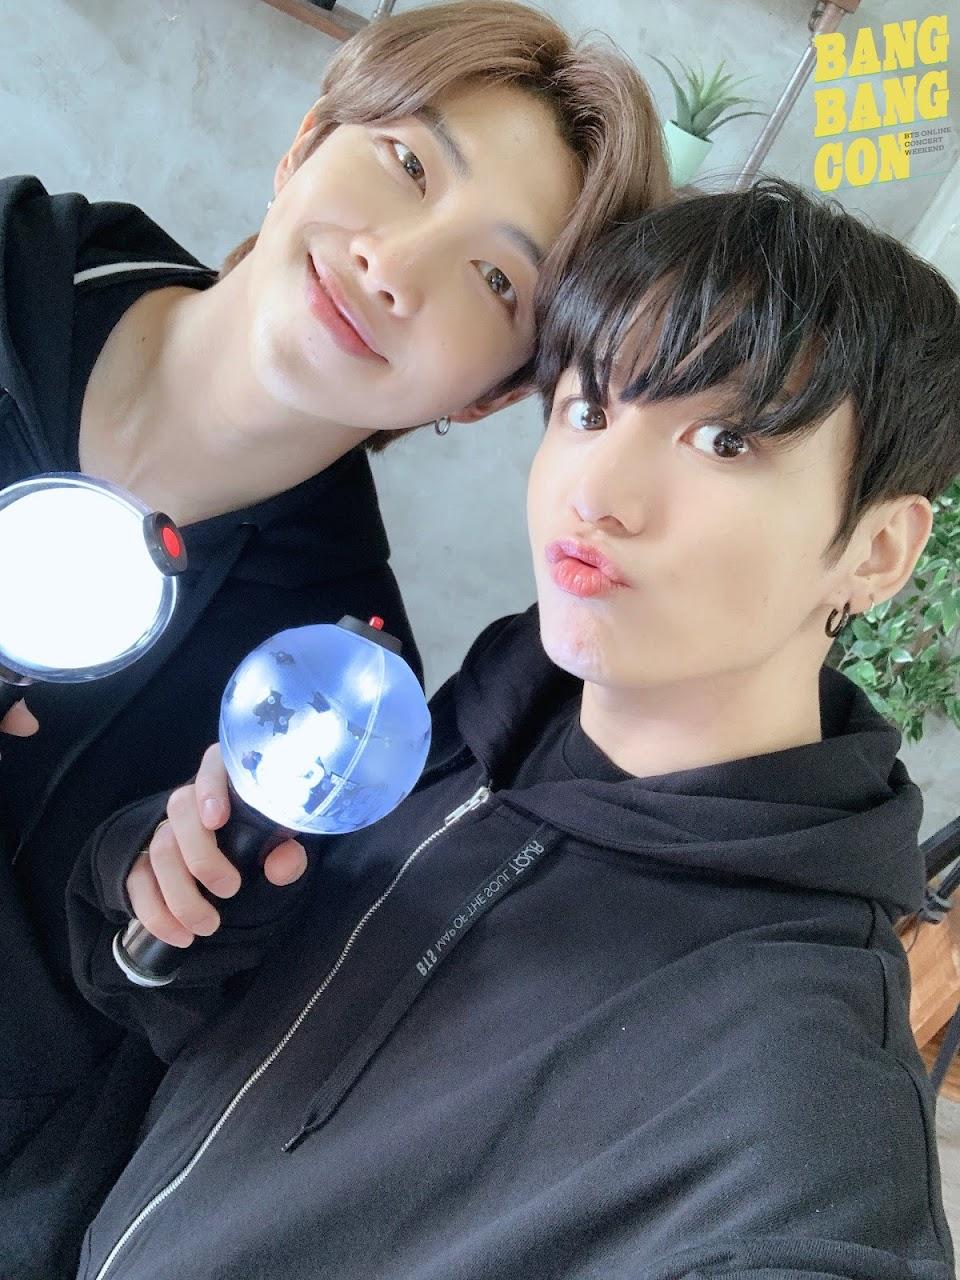 RM_Jungkook_Twitter_April_19,_2020